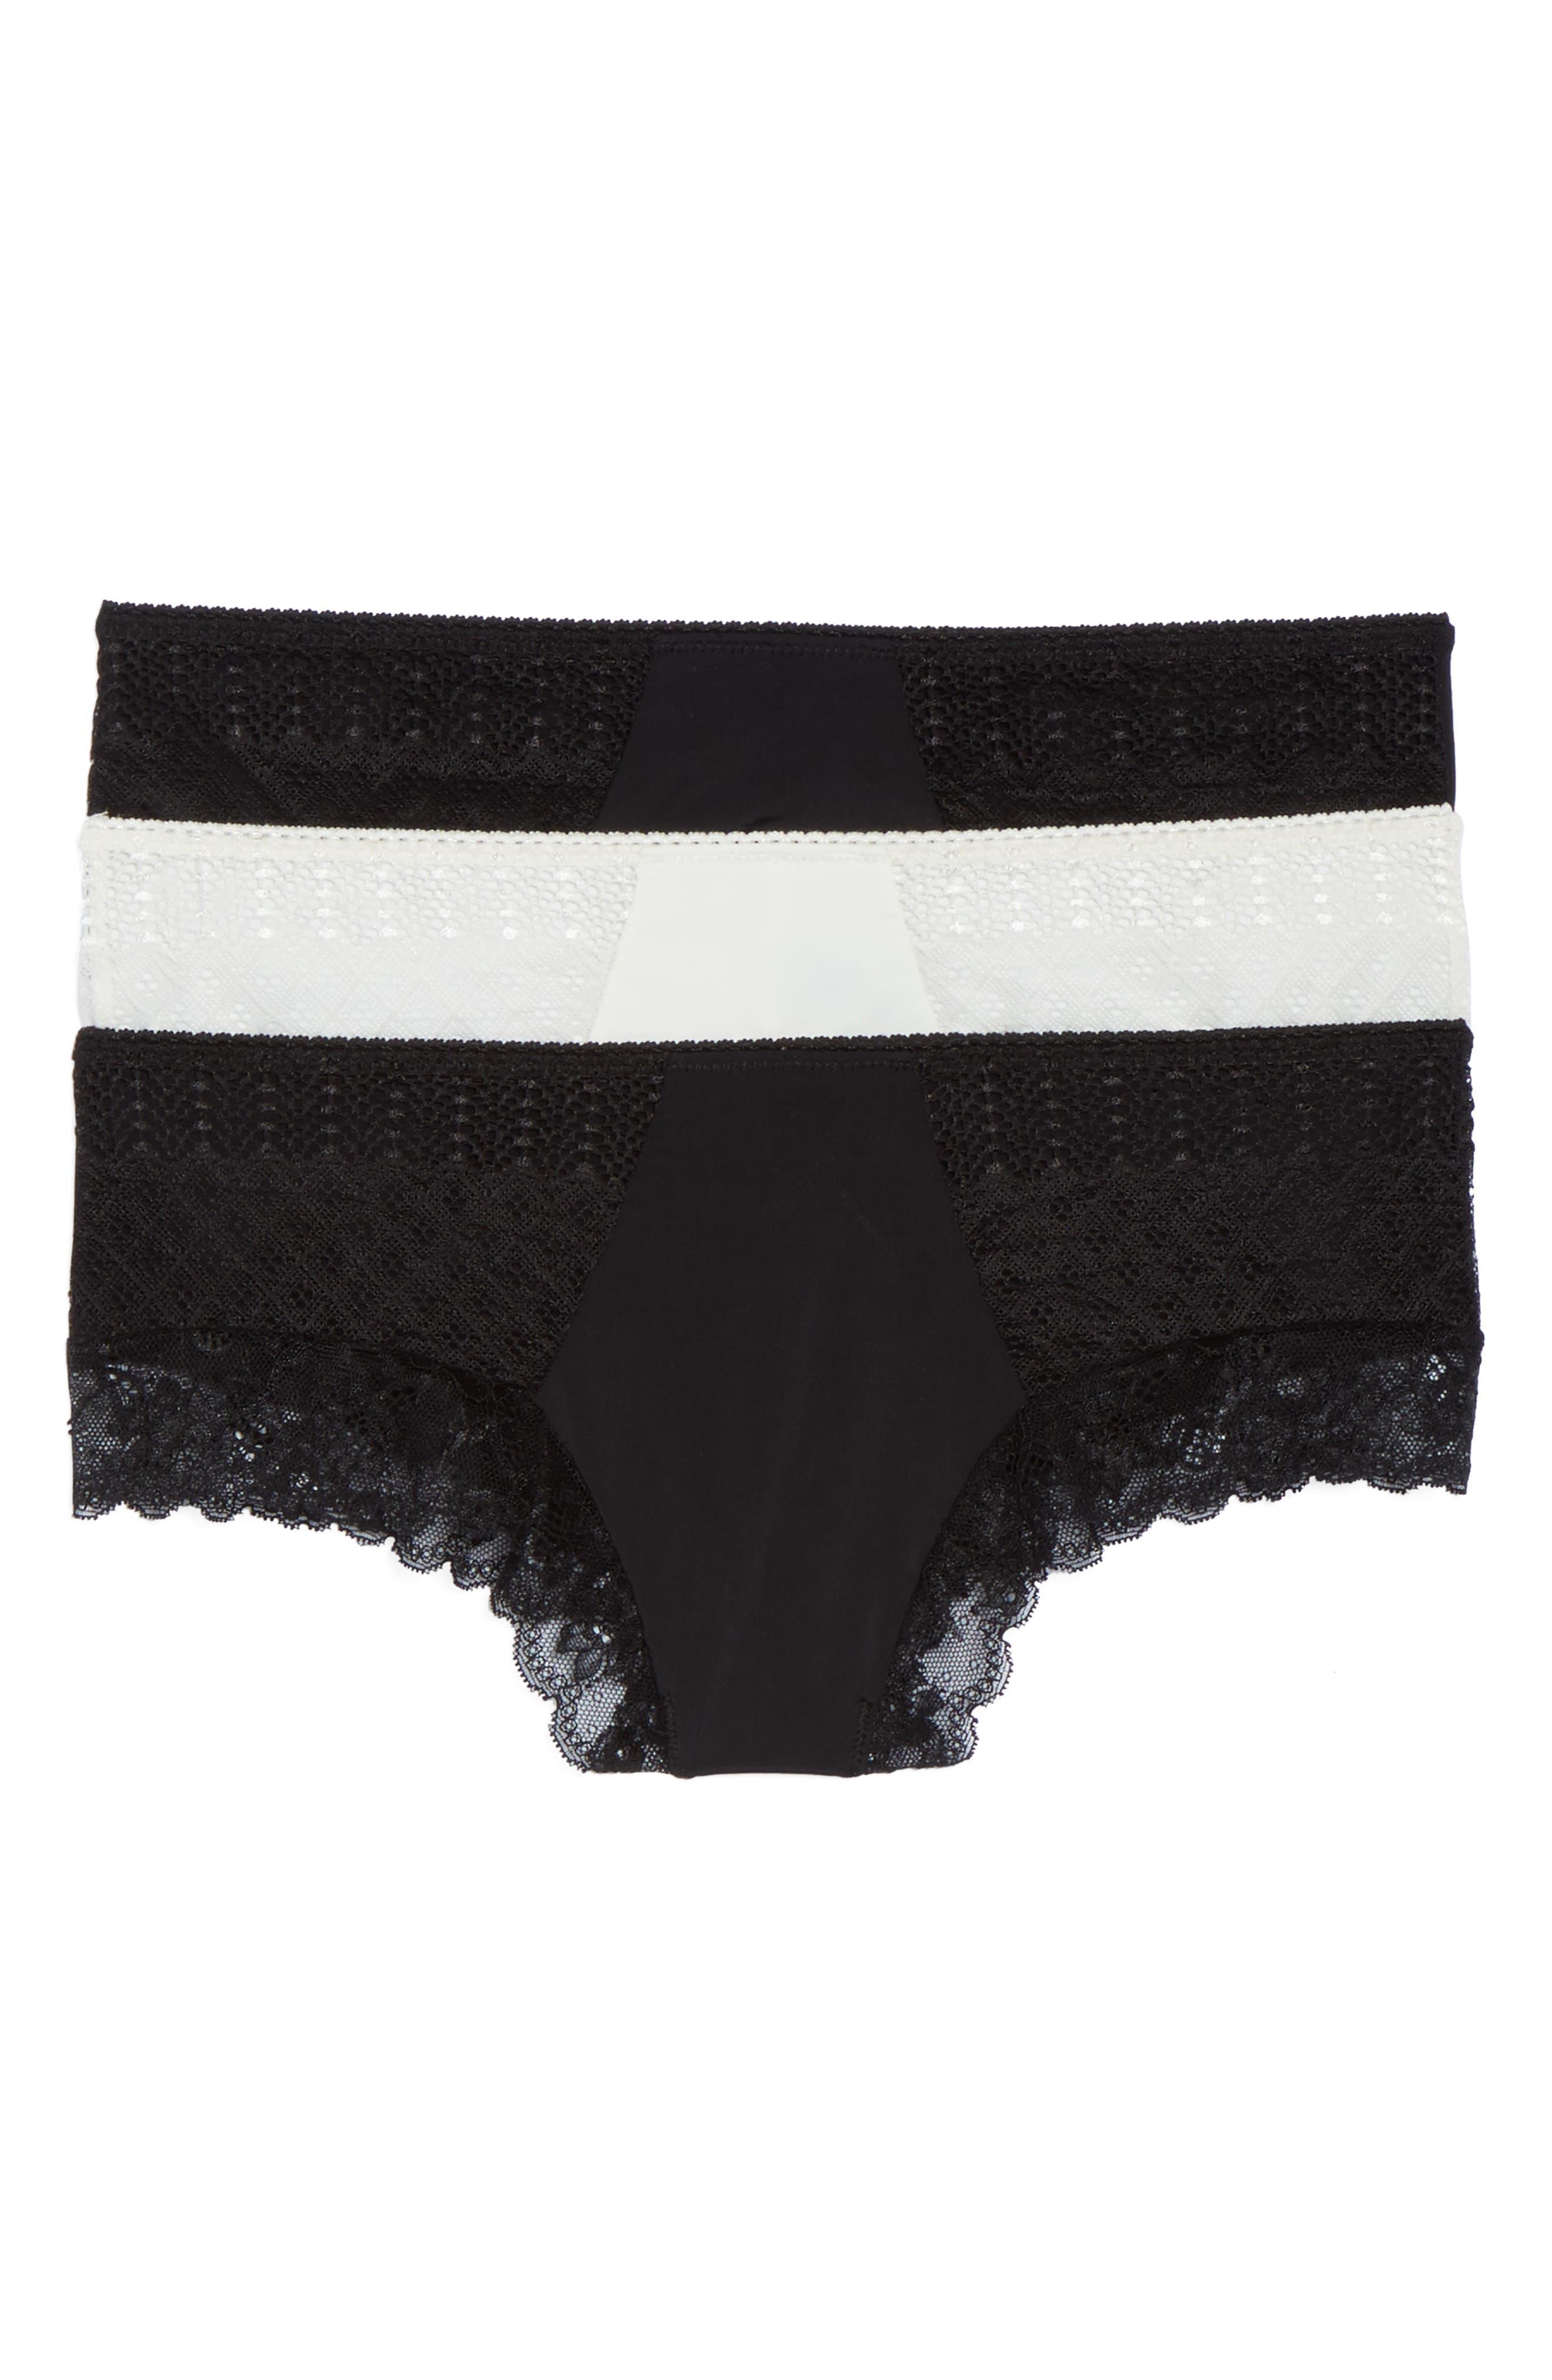 3-Pack Lace Trim Hipster Panties,                         Main,                         color, Black/ Ivory/ Black